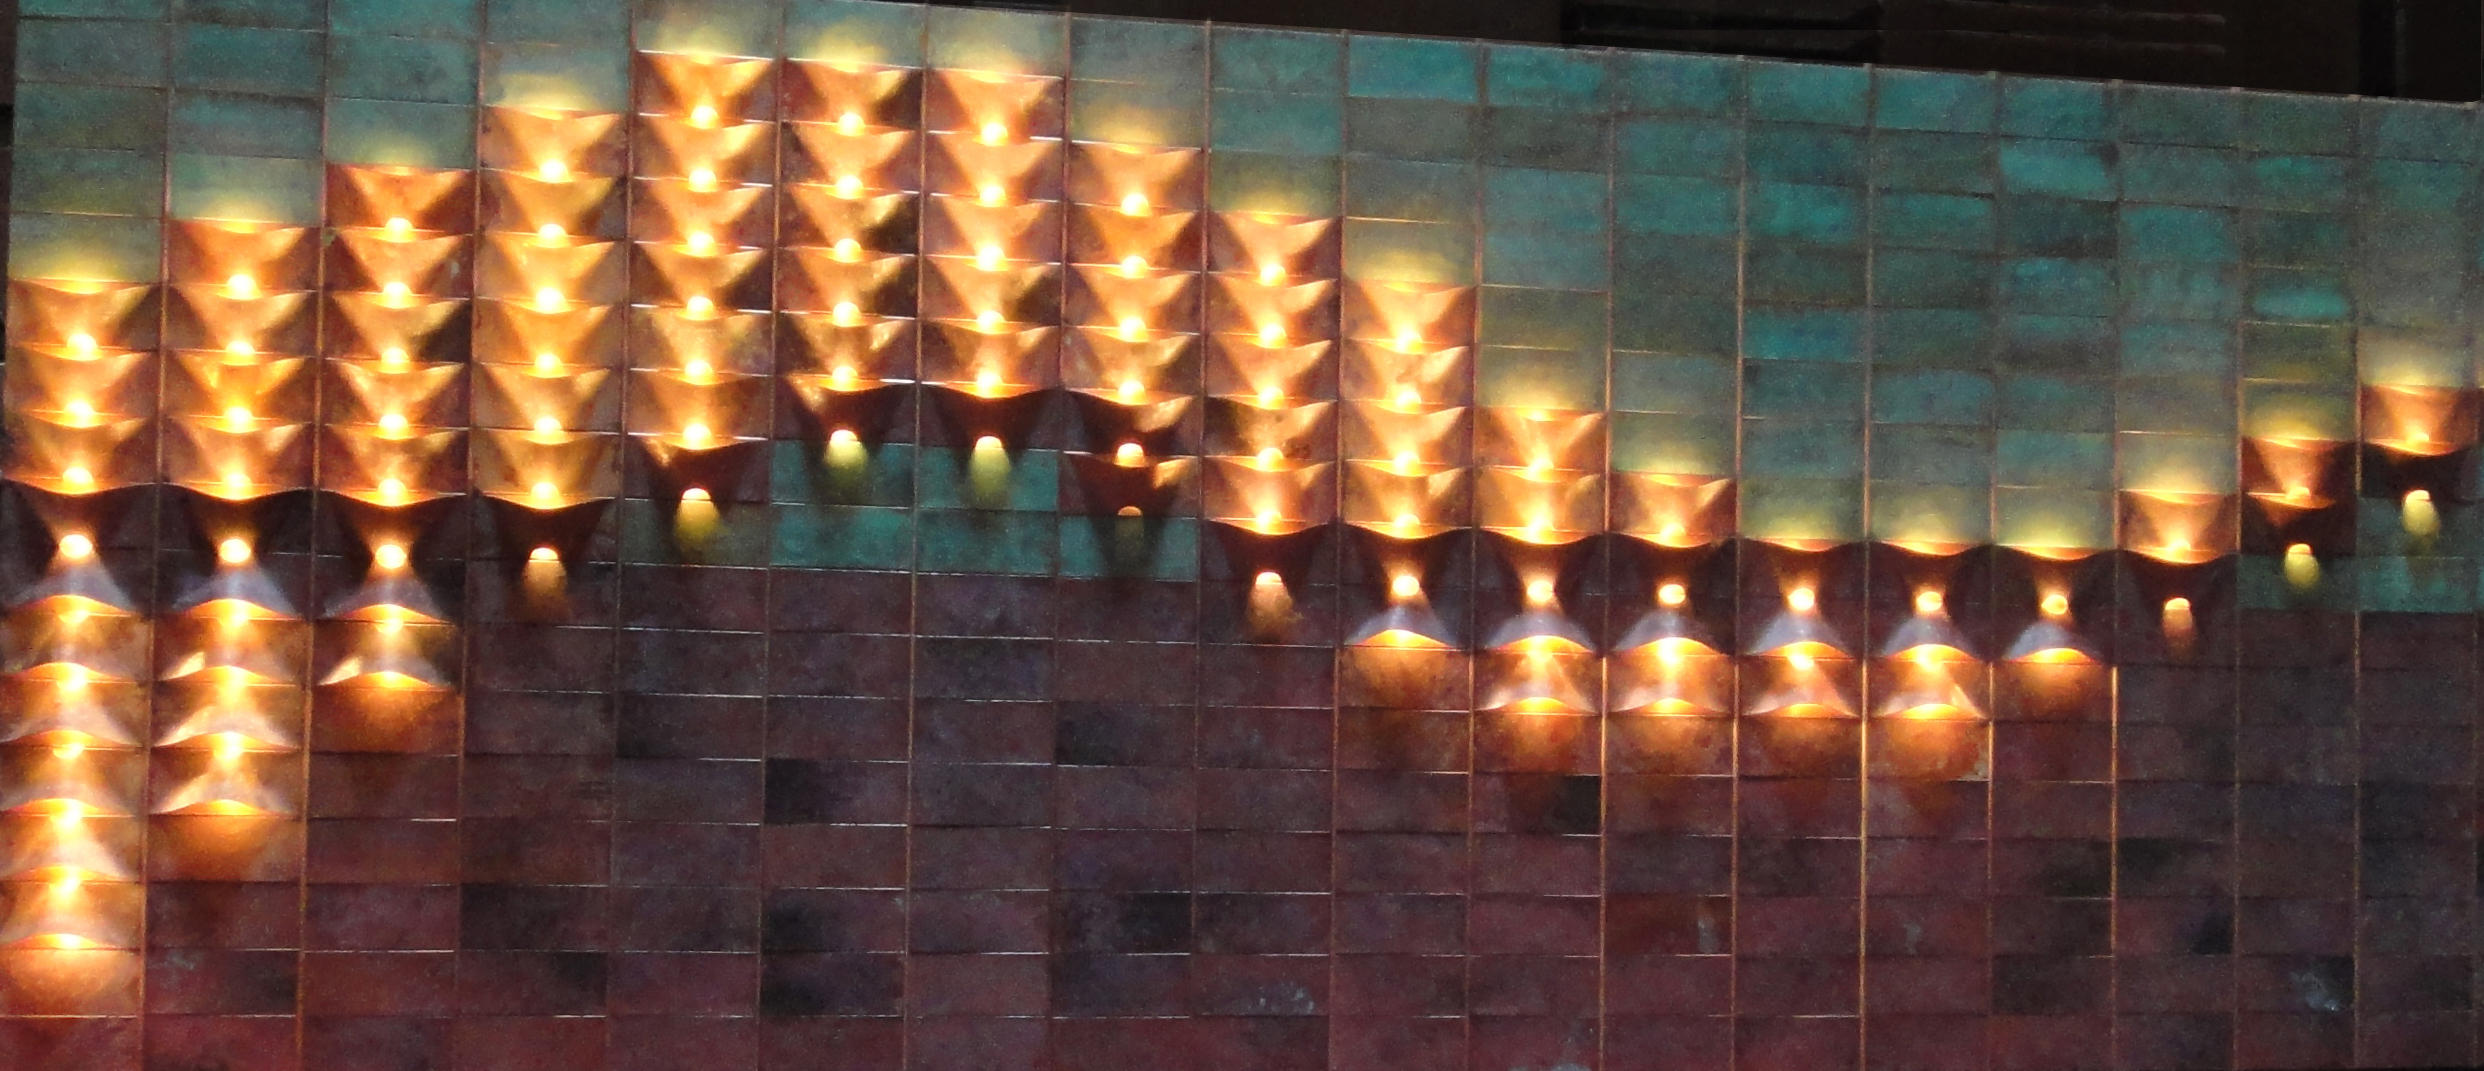 ... Lum Wall L& by Quasar | General lighting ... & LUM WALL LAMP - General lighting from Quasar | Architonic azcodes.com